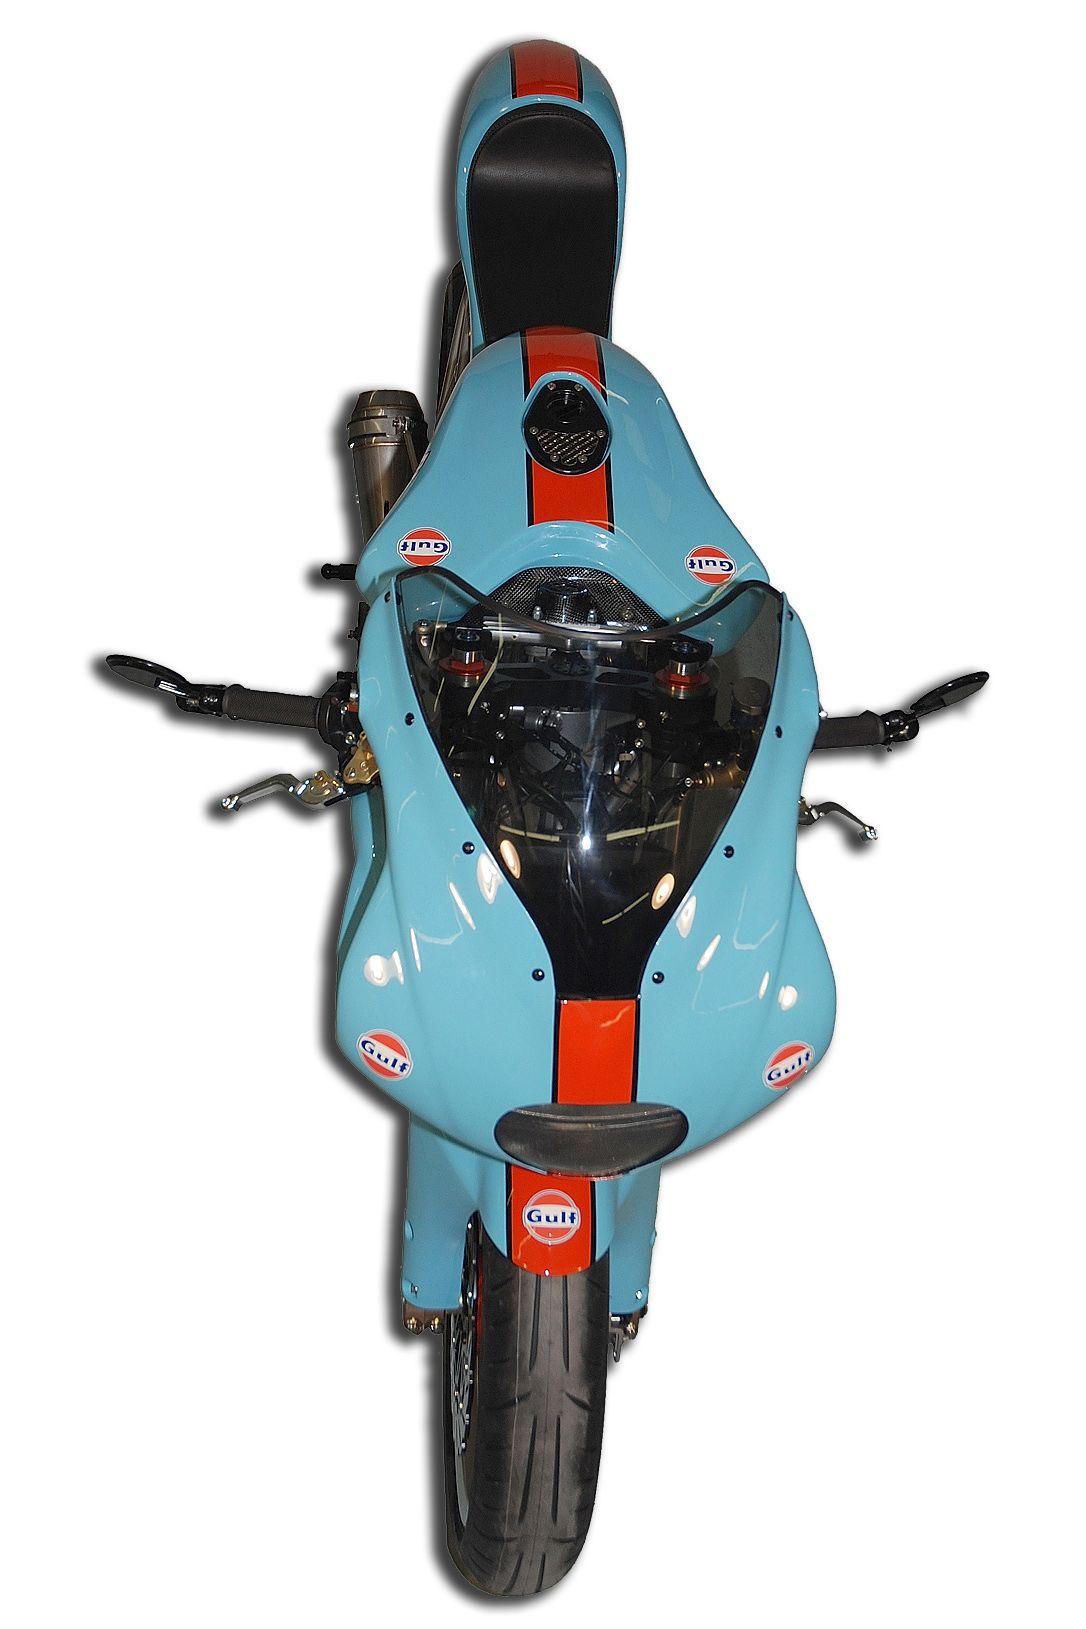 Custom Gulf Theme Ducati built by Moto Movito in Raleigh, NC